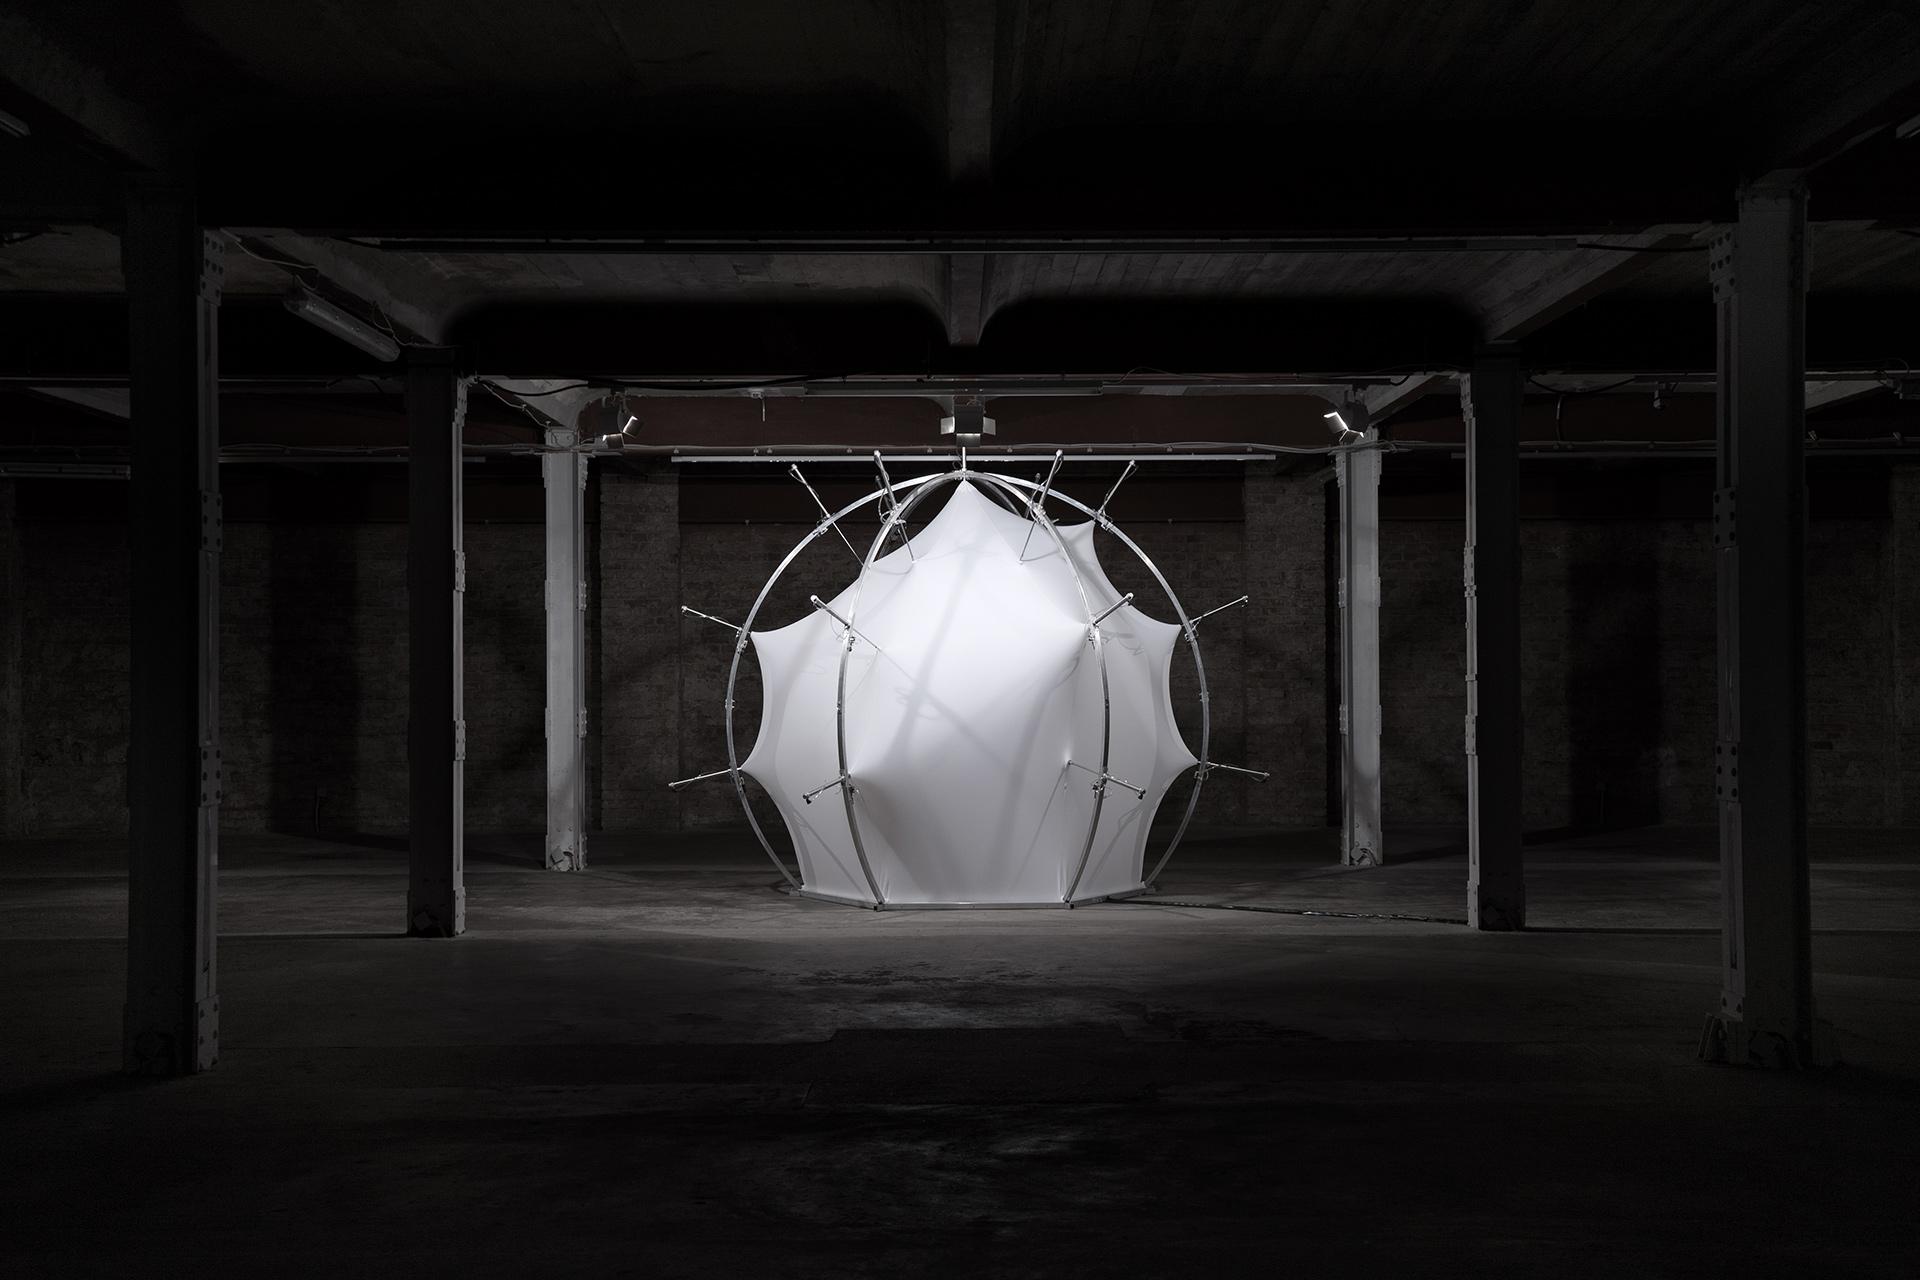 Offset XYZ<p class='client'>Selected Artists</p><div class='btm'><p class='desc'>Kinetic sculpture</p><p class='year'>2018</p></div>